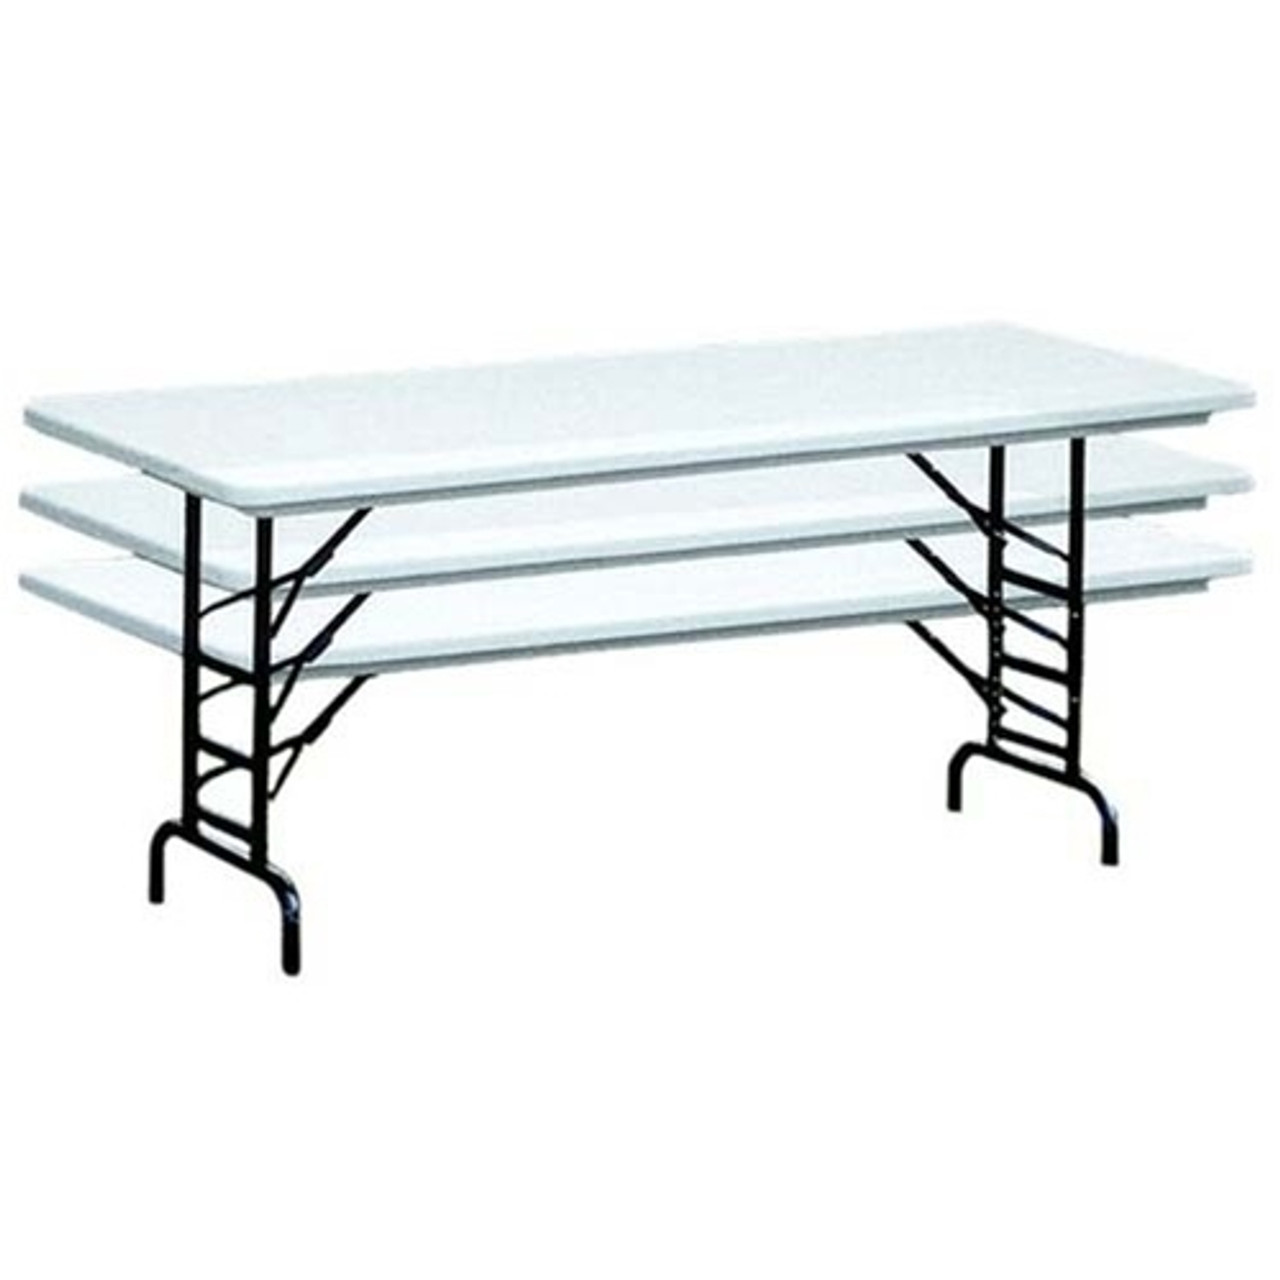 - 30x60 Adjustable Height Folding Tables Adjustable Height Folding